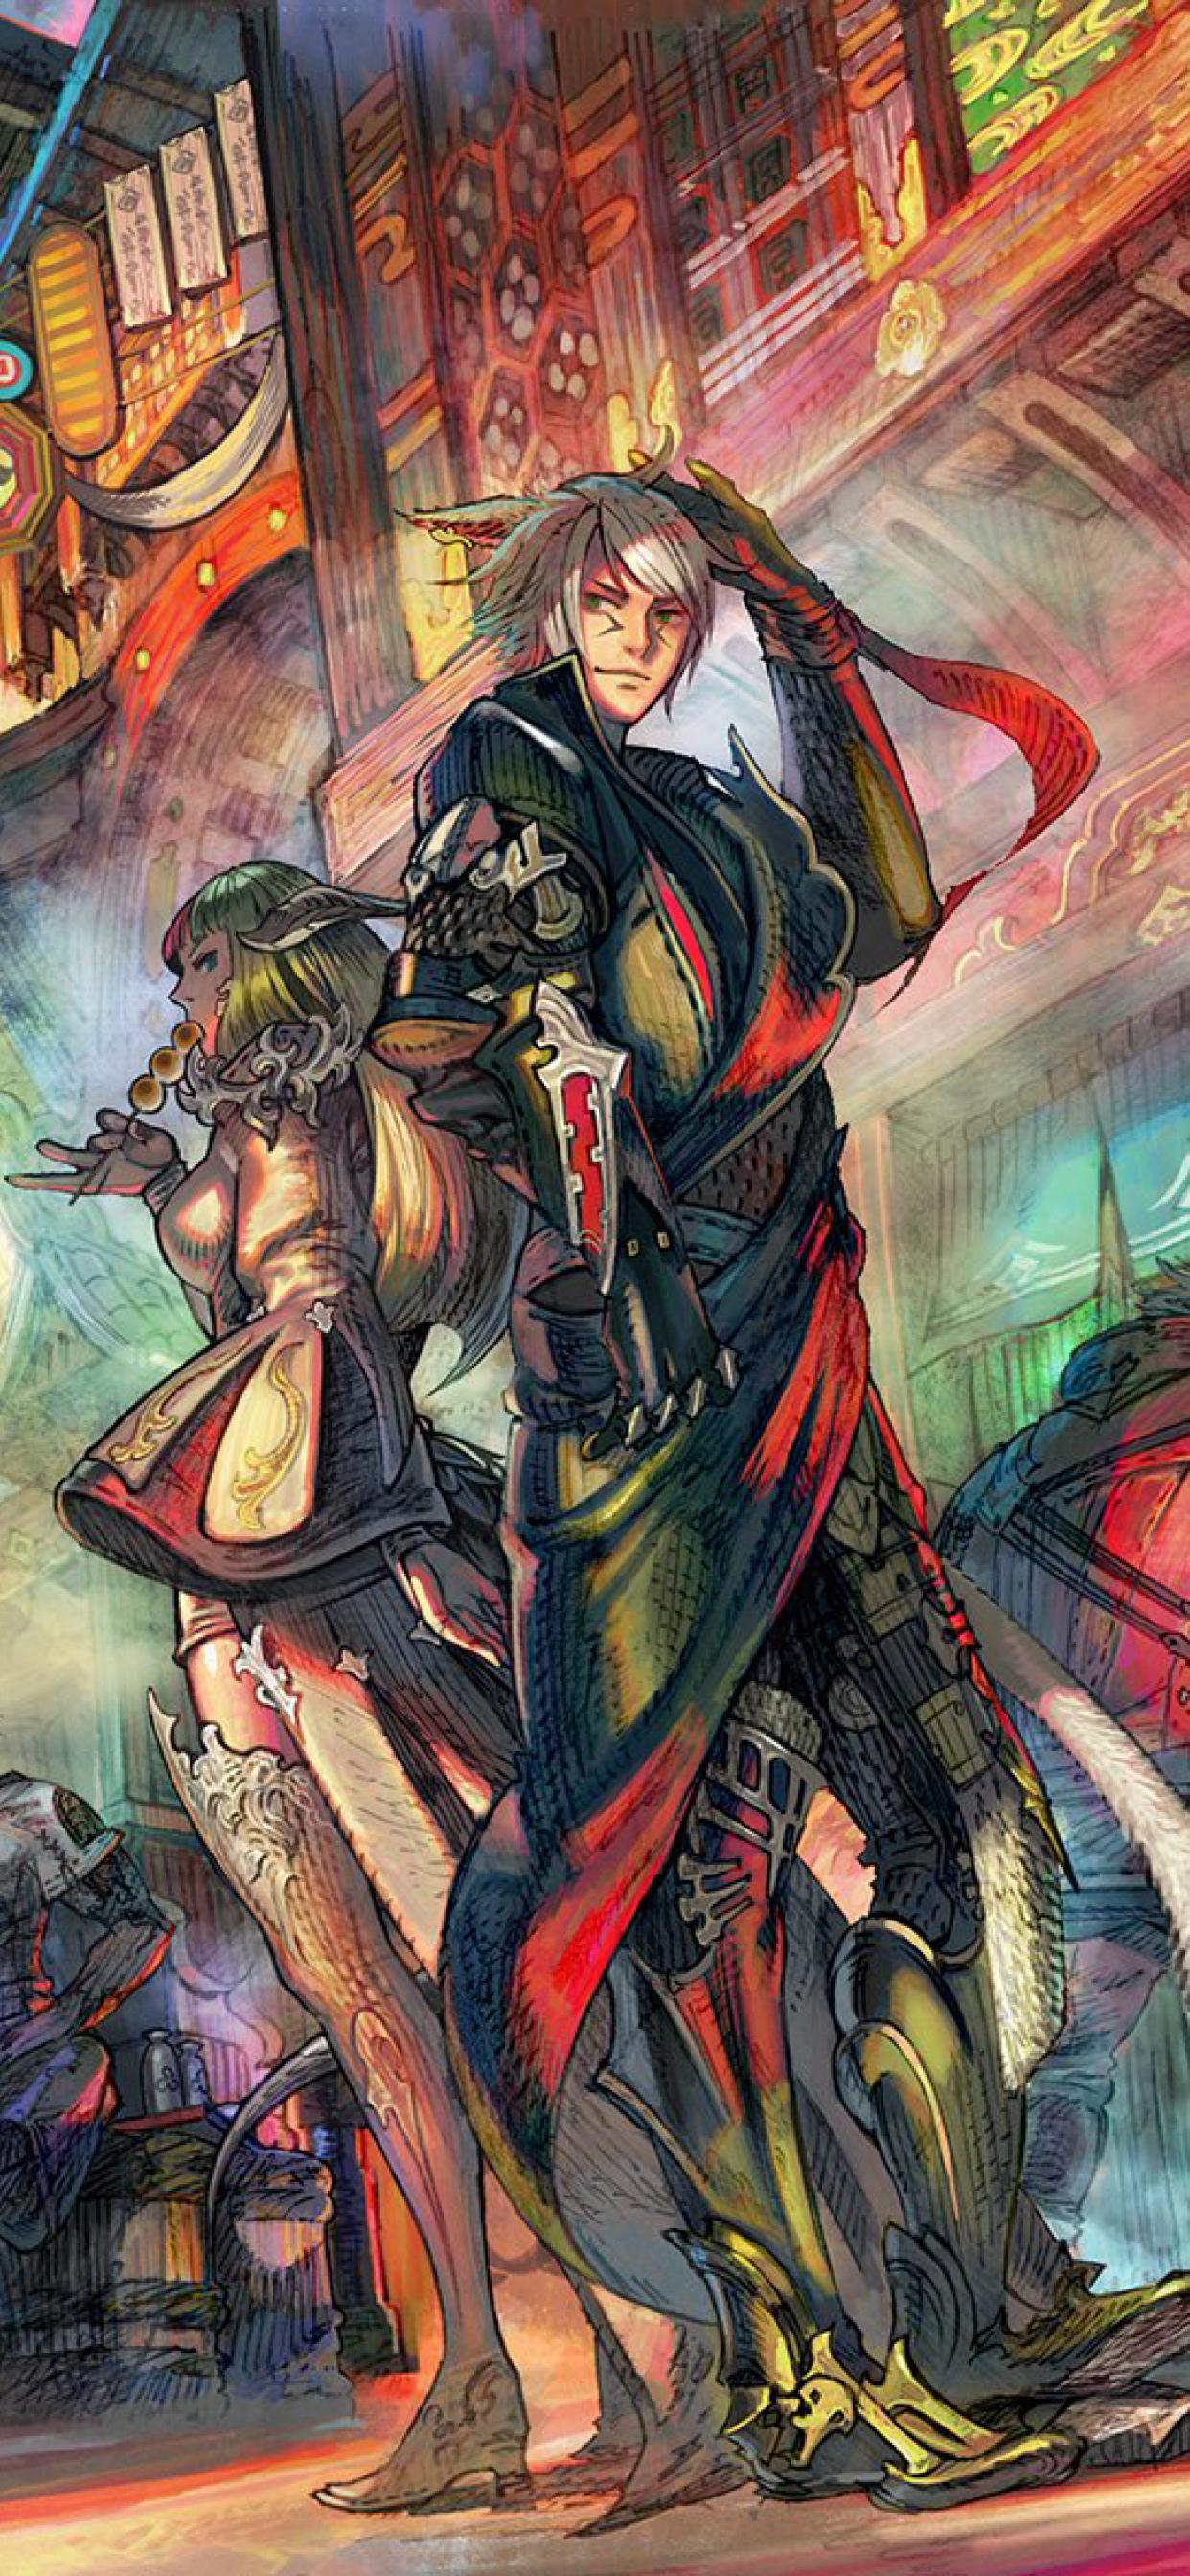 1242x2688 Final Fantasy 14 Stormblood Iphone Xs Max Wallpaper Hd